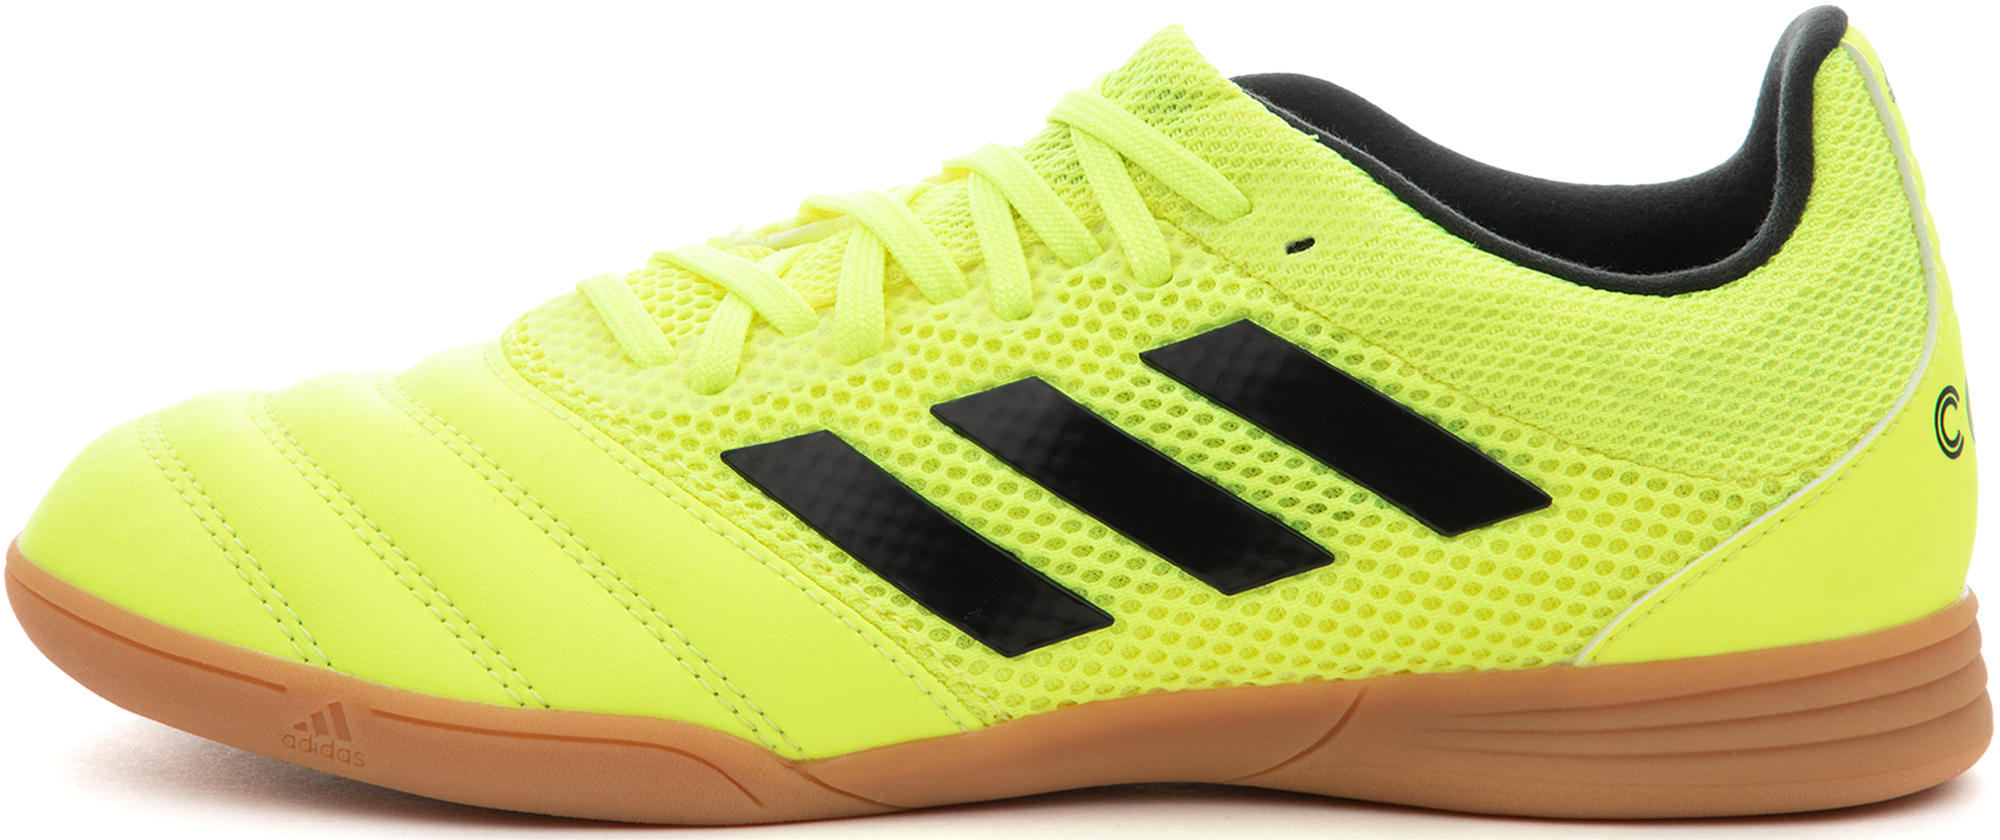 Adidas Бутсы детские Adidas Copa 19.3 IN Sala, размер 37,5